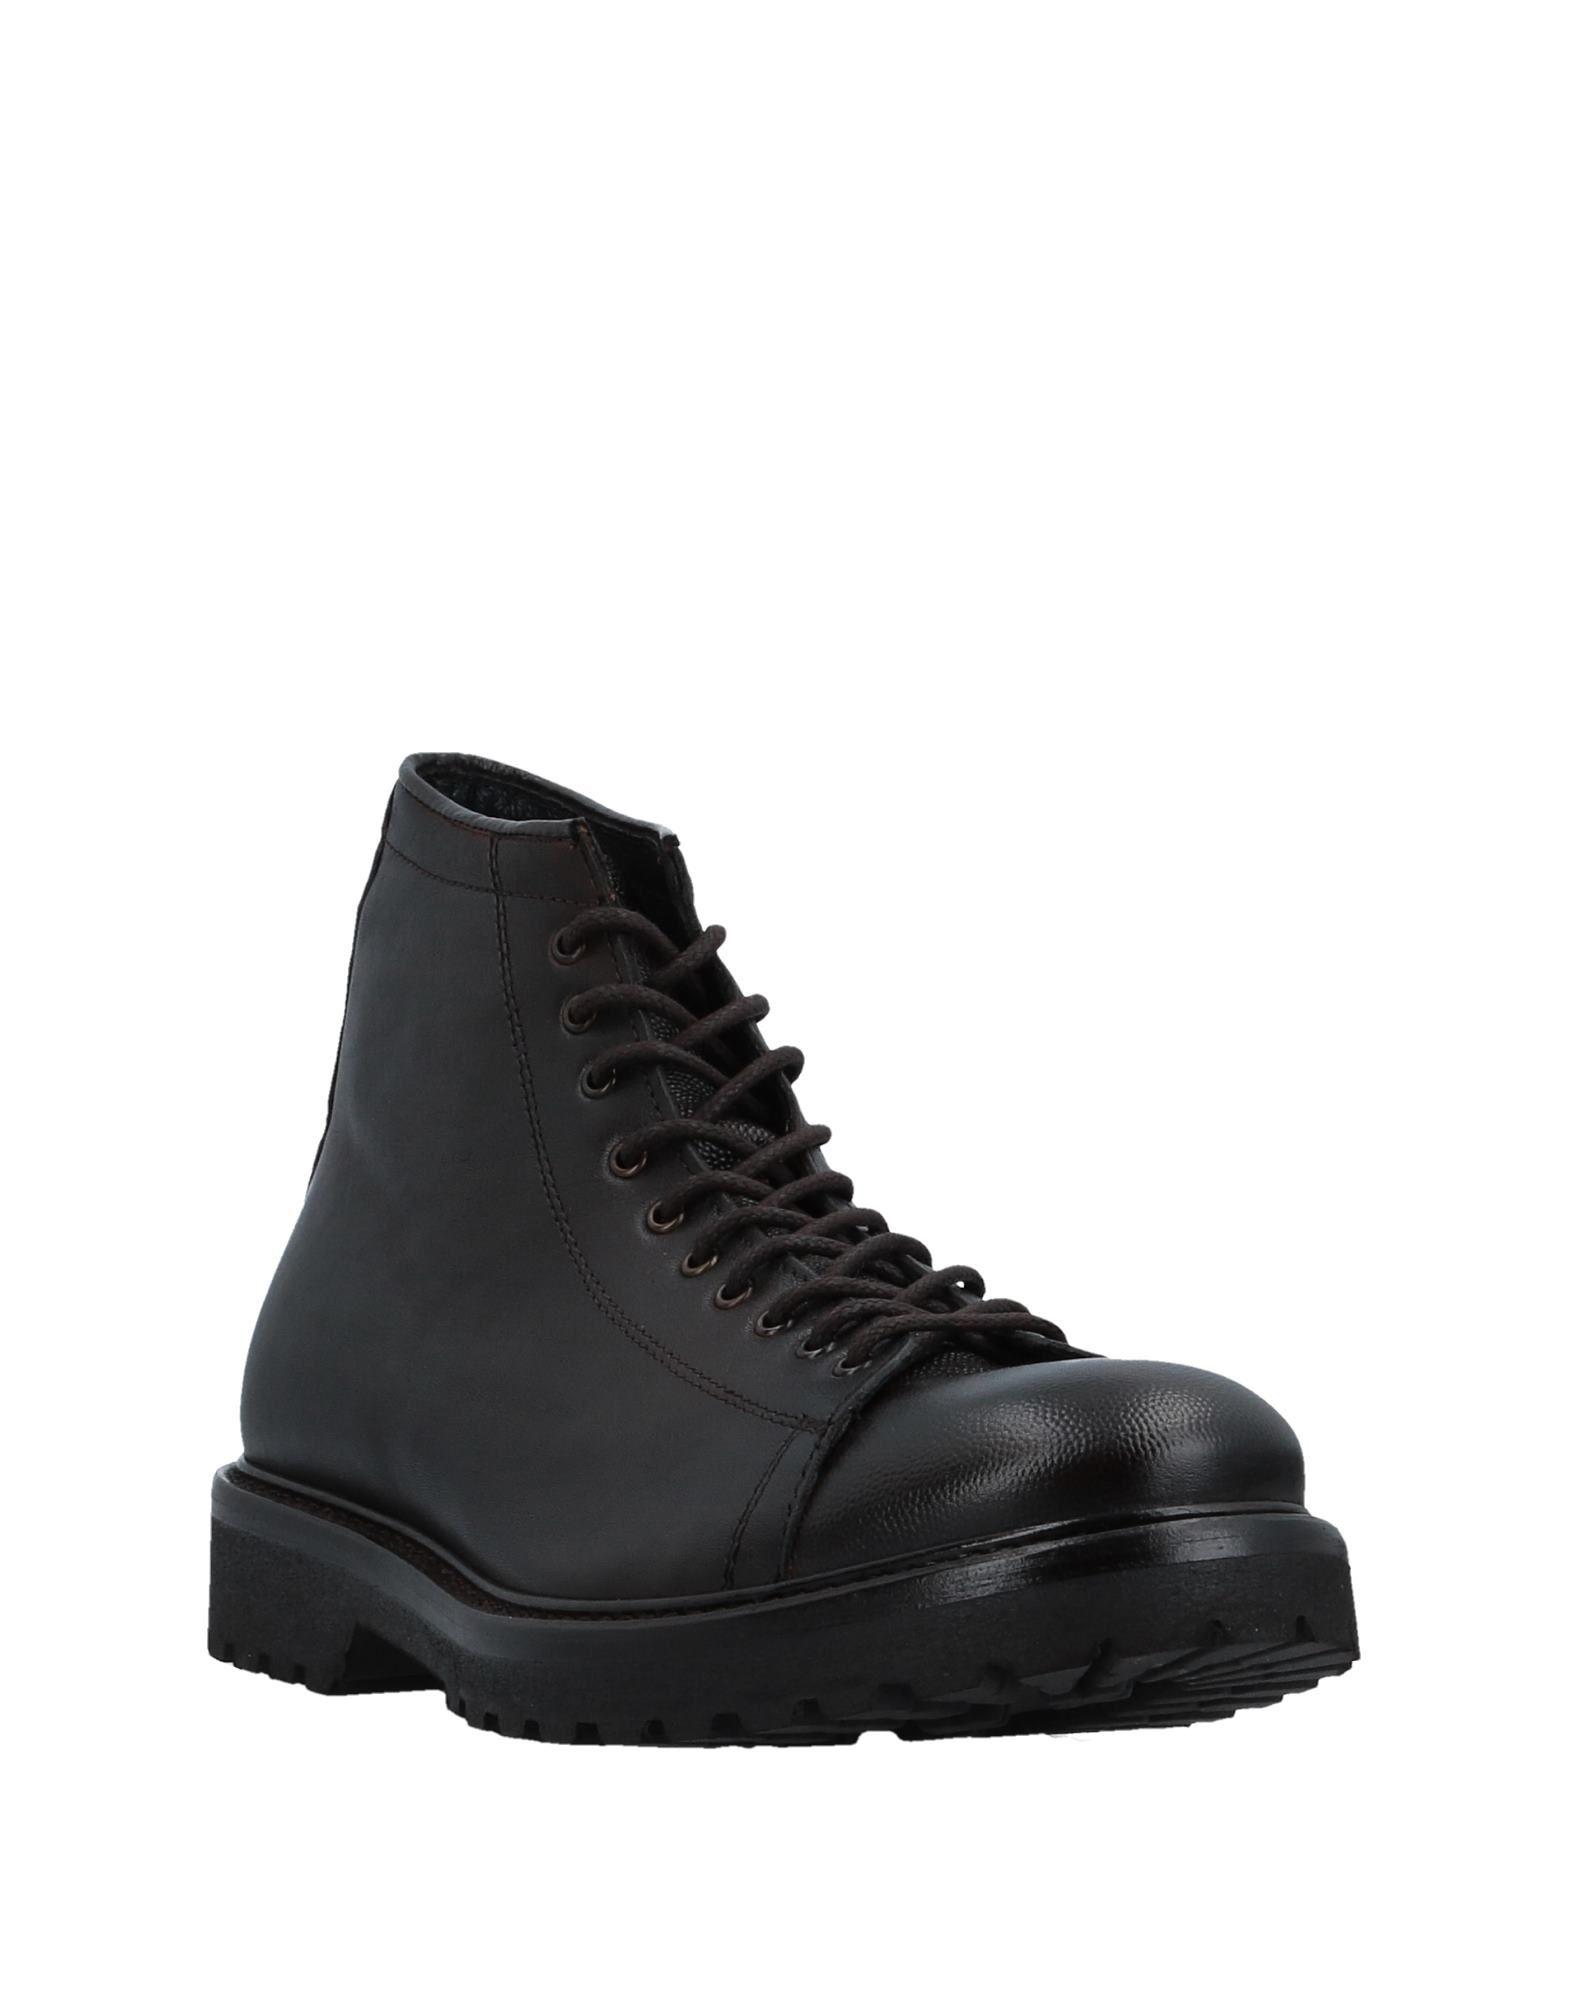 Rabatt echte Schuhe Schuhe Schuhe Hamaki 11510093WC Günstige und langlebige Schuhe 643230